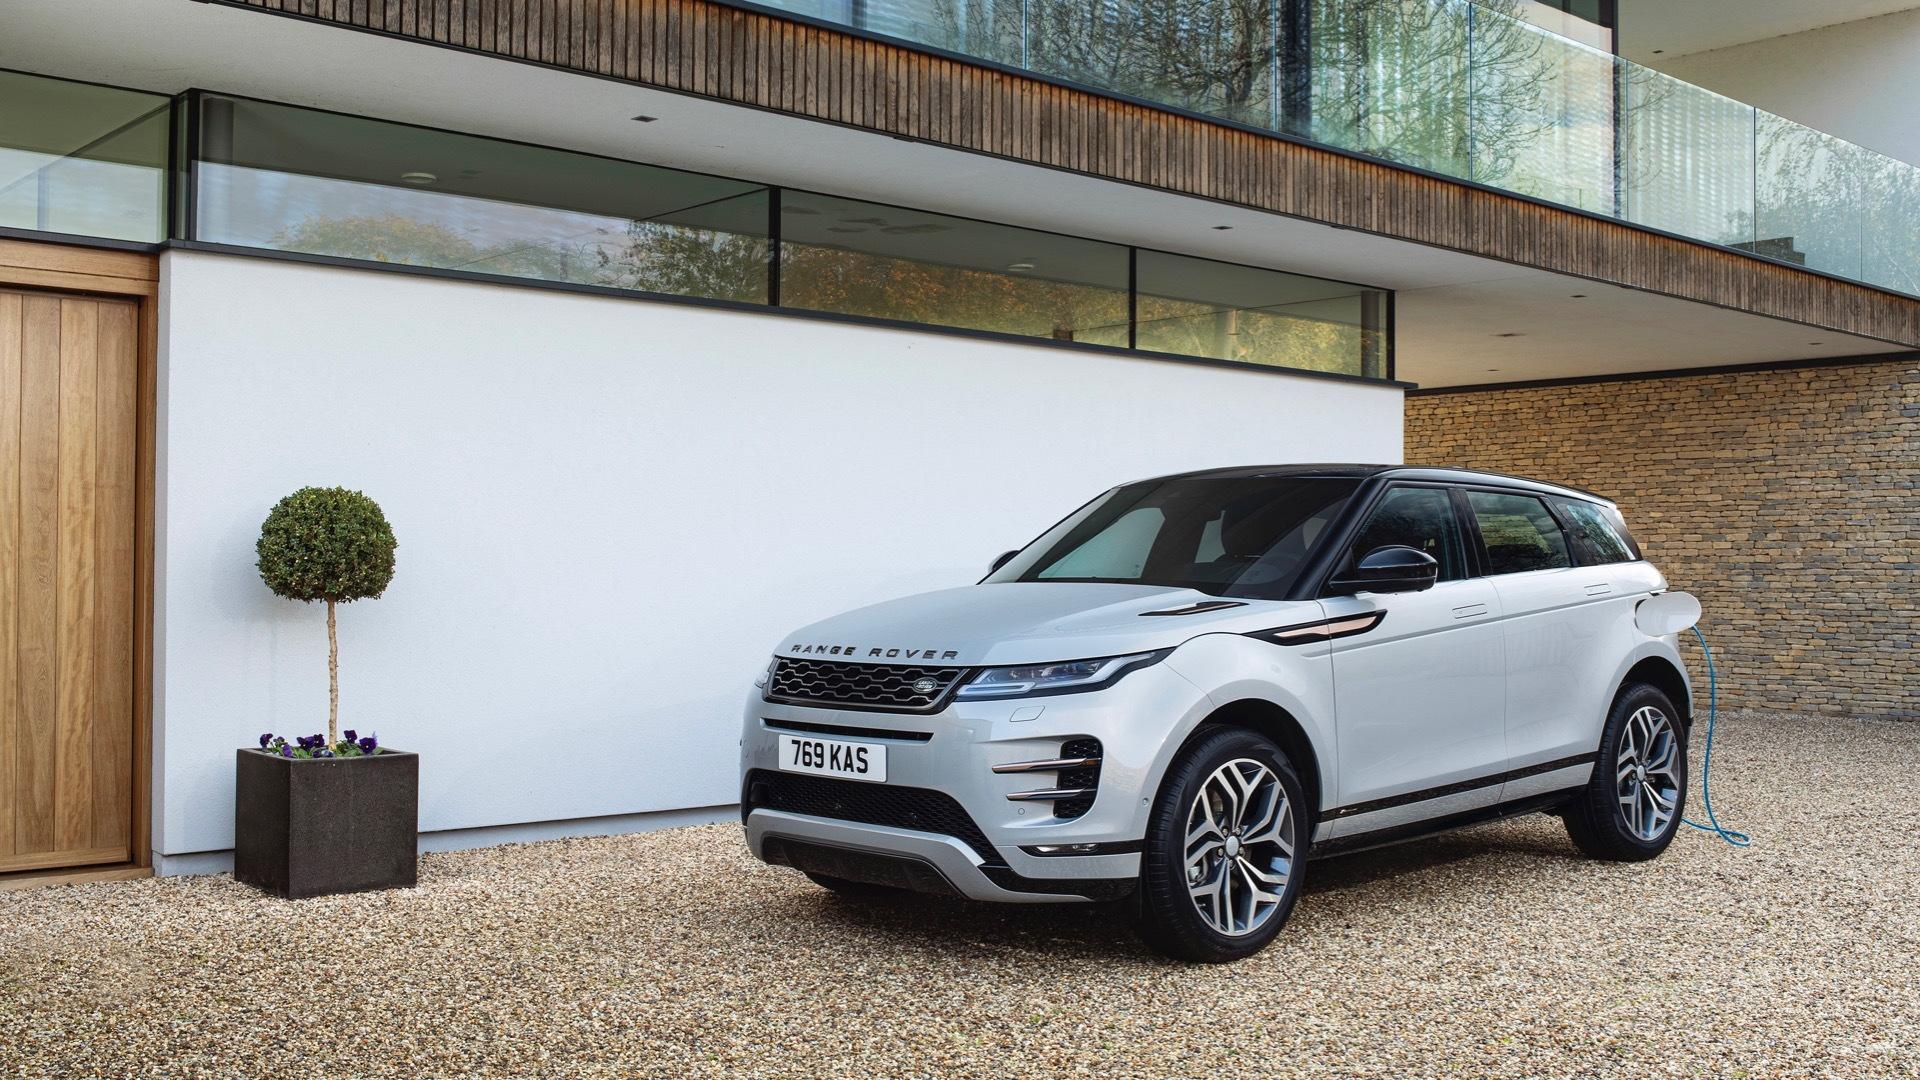 Land Rover Range Rover Evoque plug-in hybrid